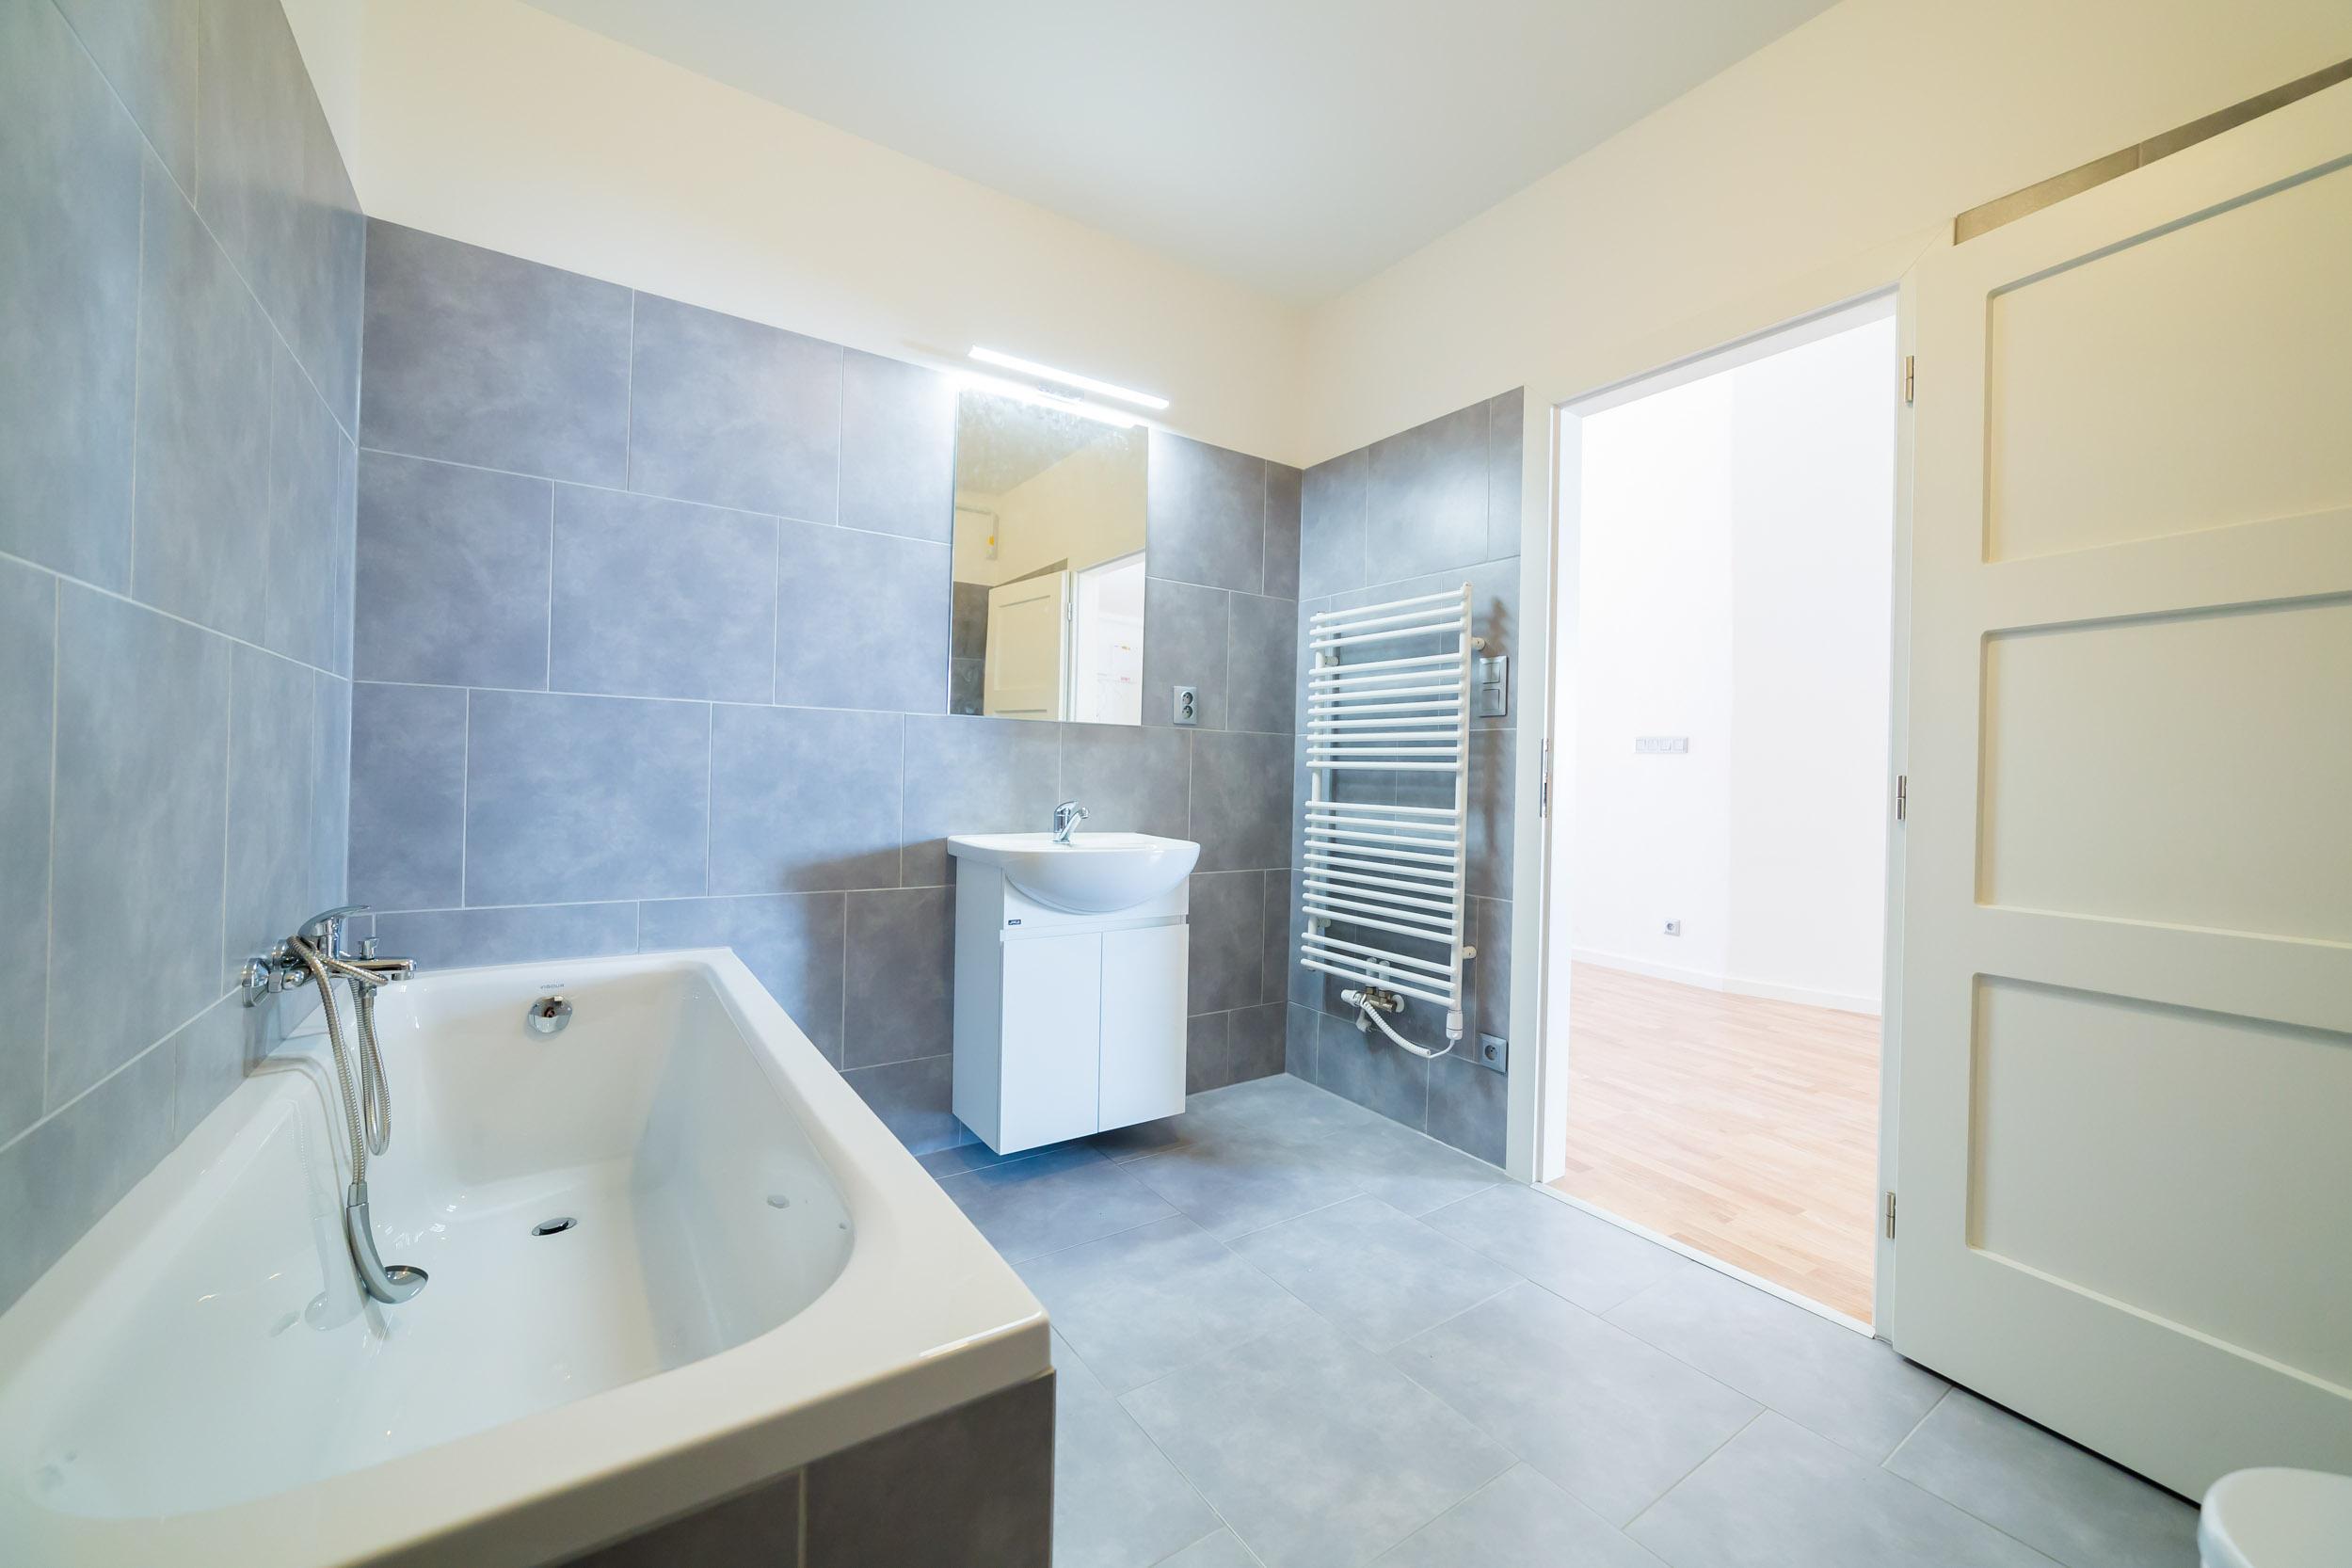 opava reality koupelna vana radiator umyvadlo dlazba dvere svetlo skrinka zachod baterie